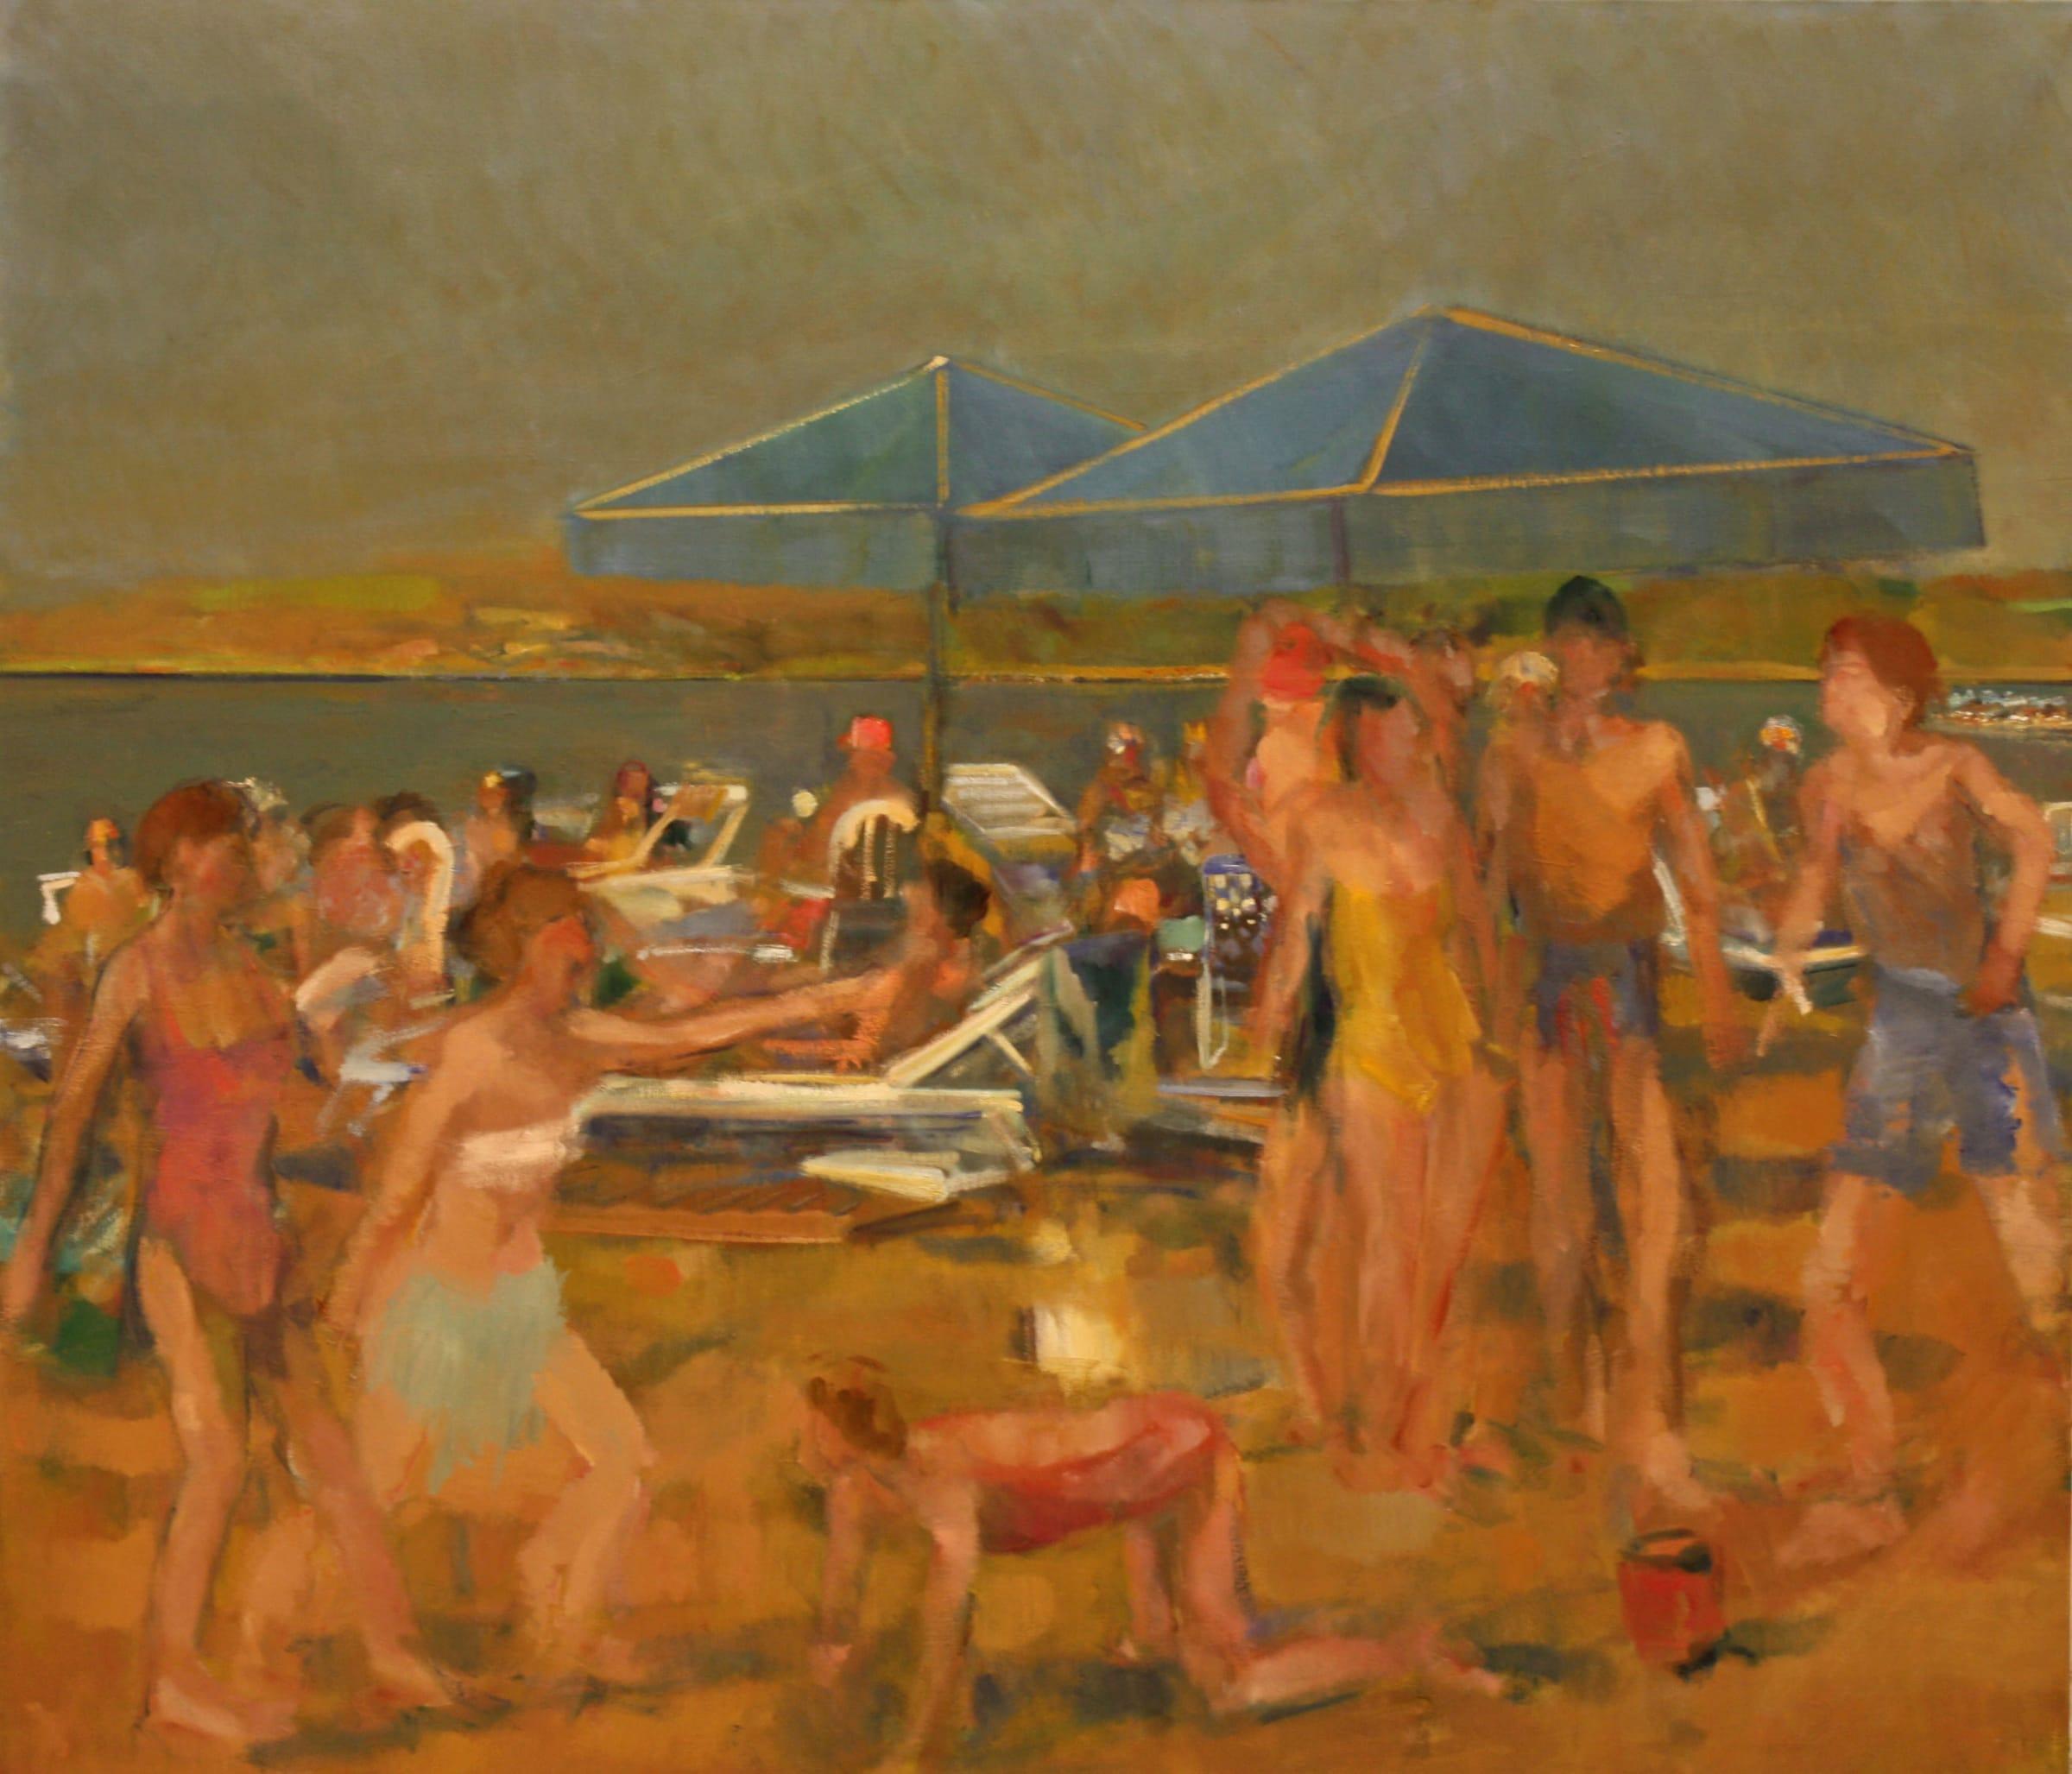 "<span class=""link fancybox-details-link""><a href=""/artists/59-simon-nicholas/works/1125-simon-nicholas-beach-spartans/"">View Detail Page</a></span><div class=""artist""><strong>Simon Nicholas</strong></div> <div class=""title""><em>Beach Spartans</em></div> <div class=""medium"">Oil on Canvas</div> <div class=""dimensions"">57 x 63 inches </div>"